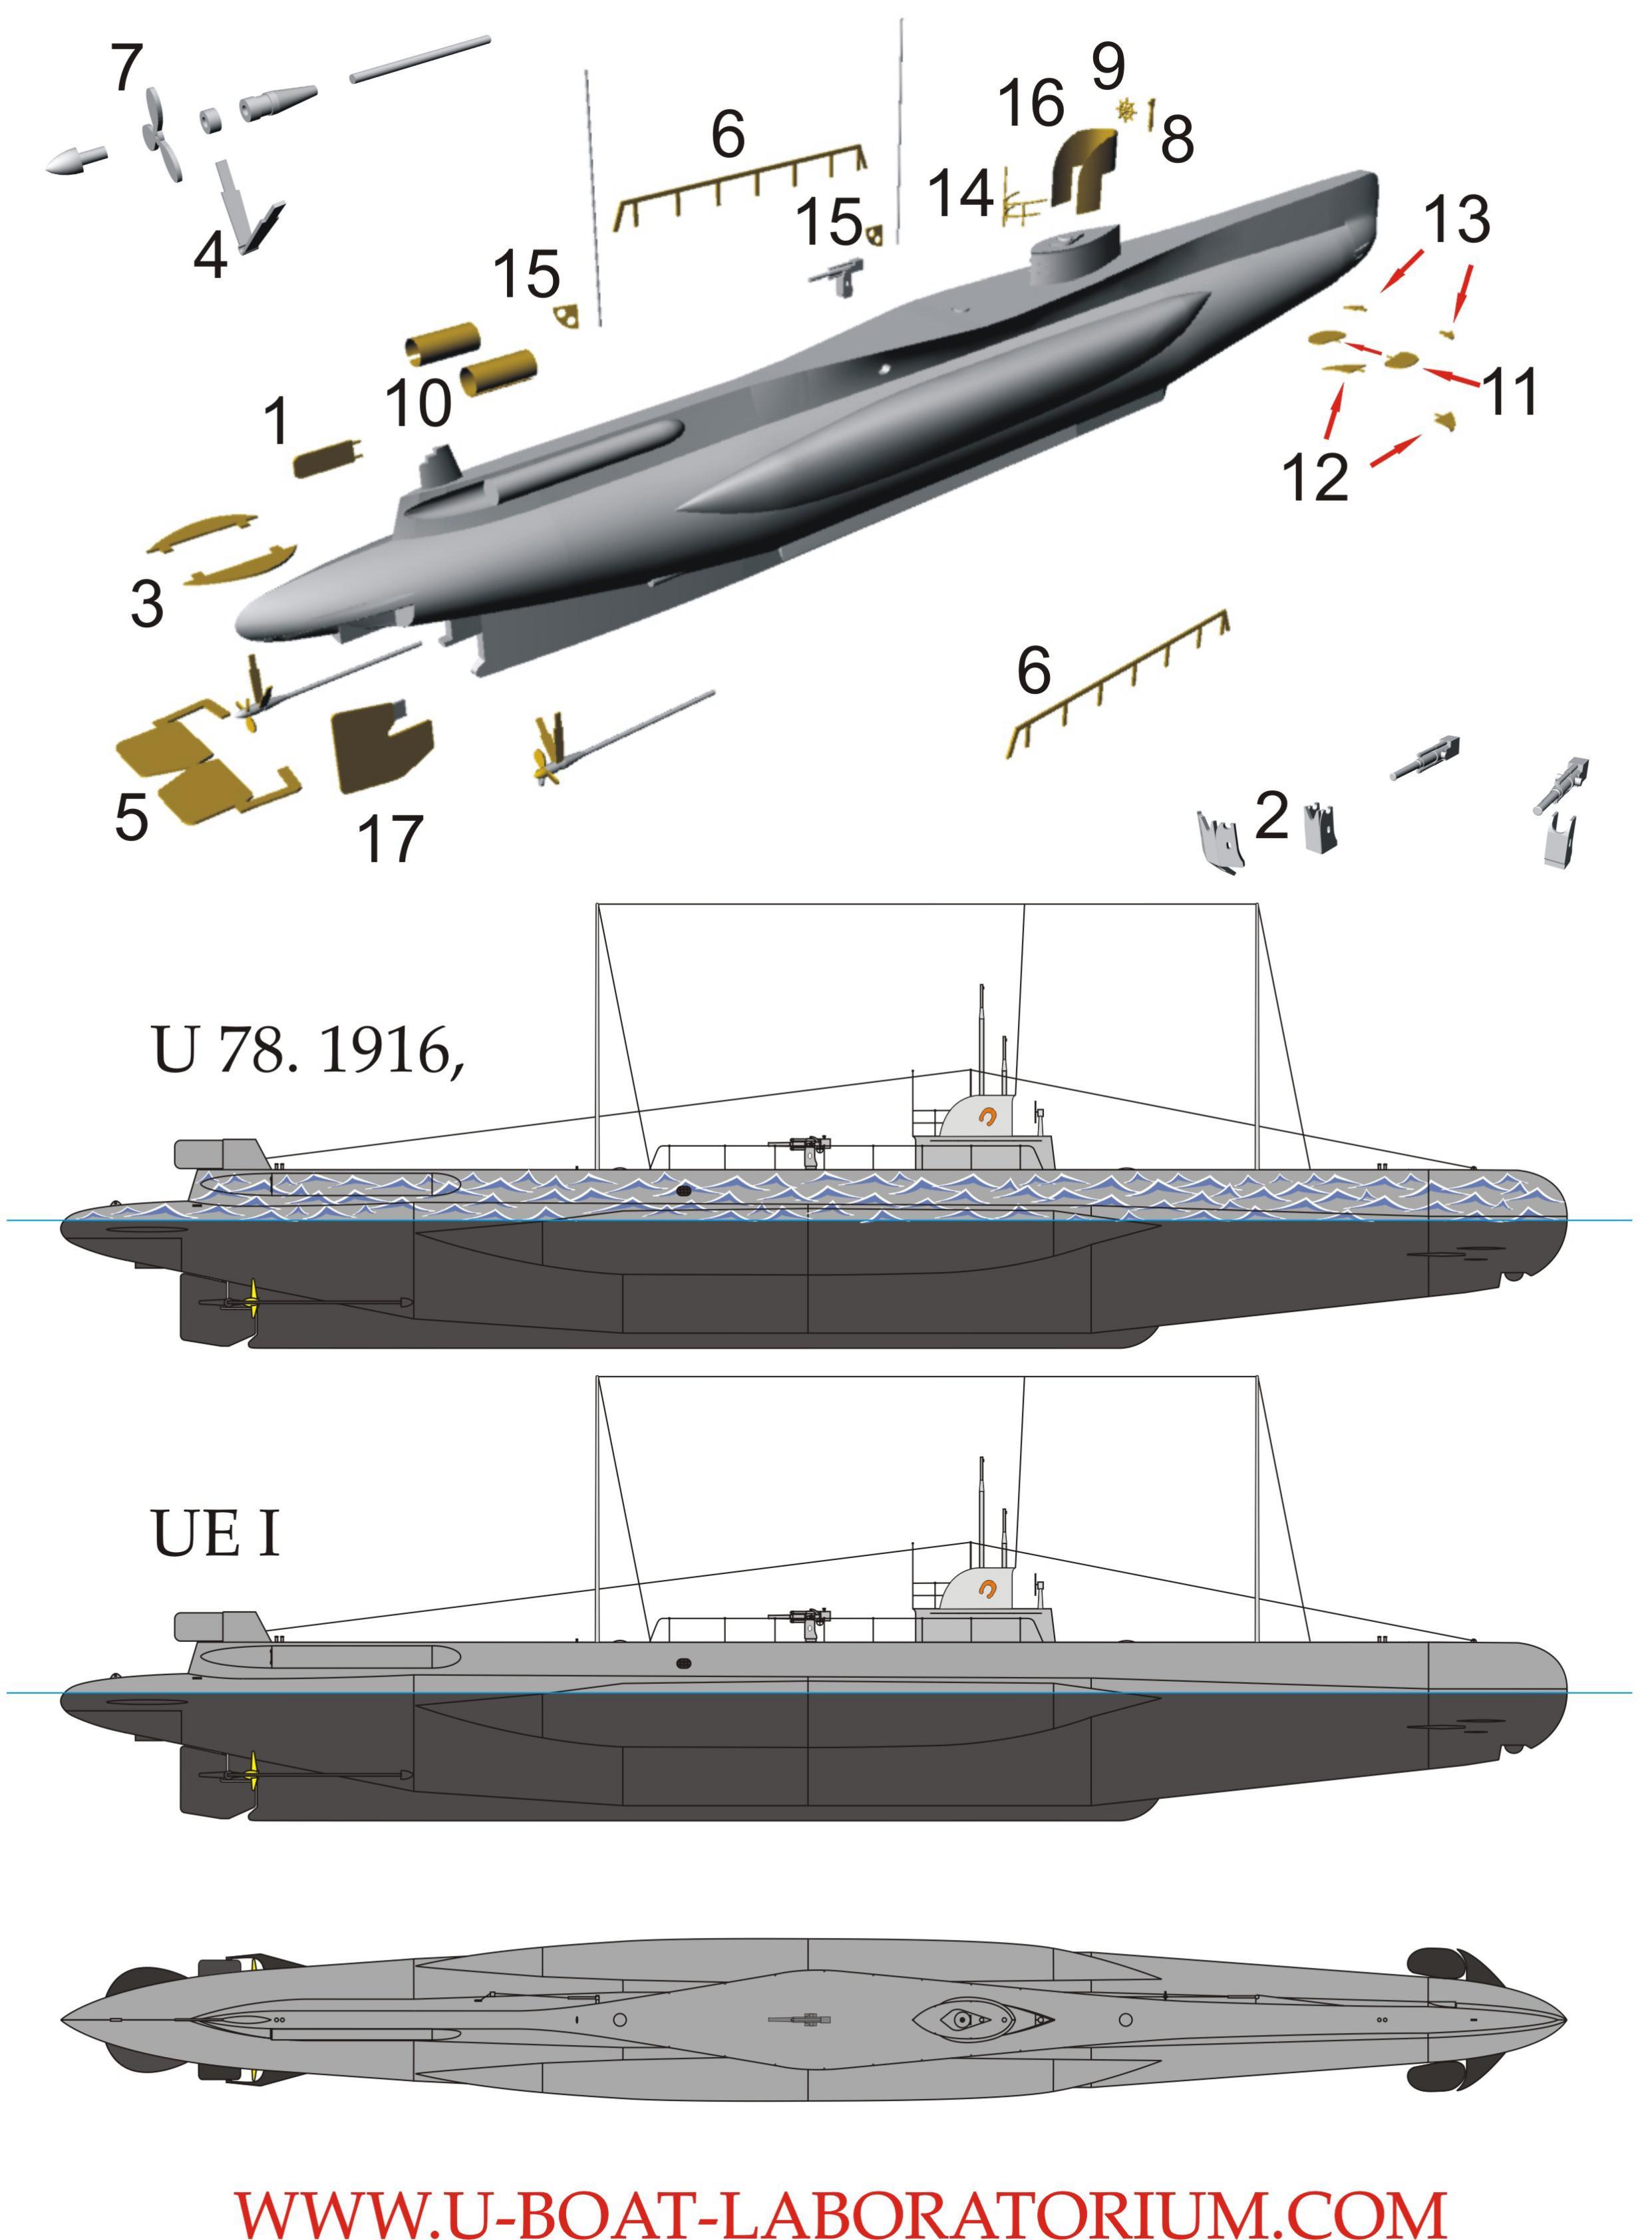 78 Images About Temperance On Pinterest: German Submarine U-78, 1916, 1/350